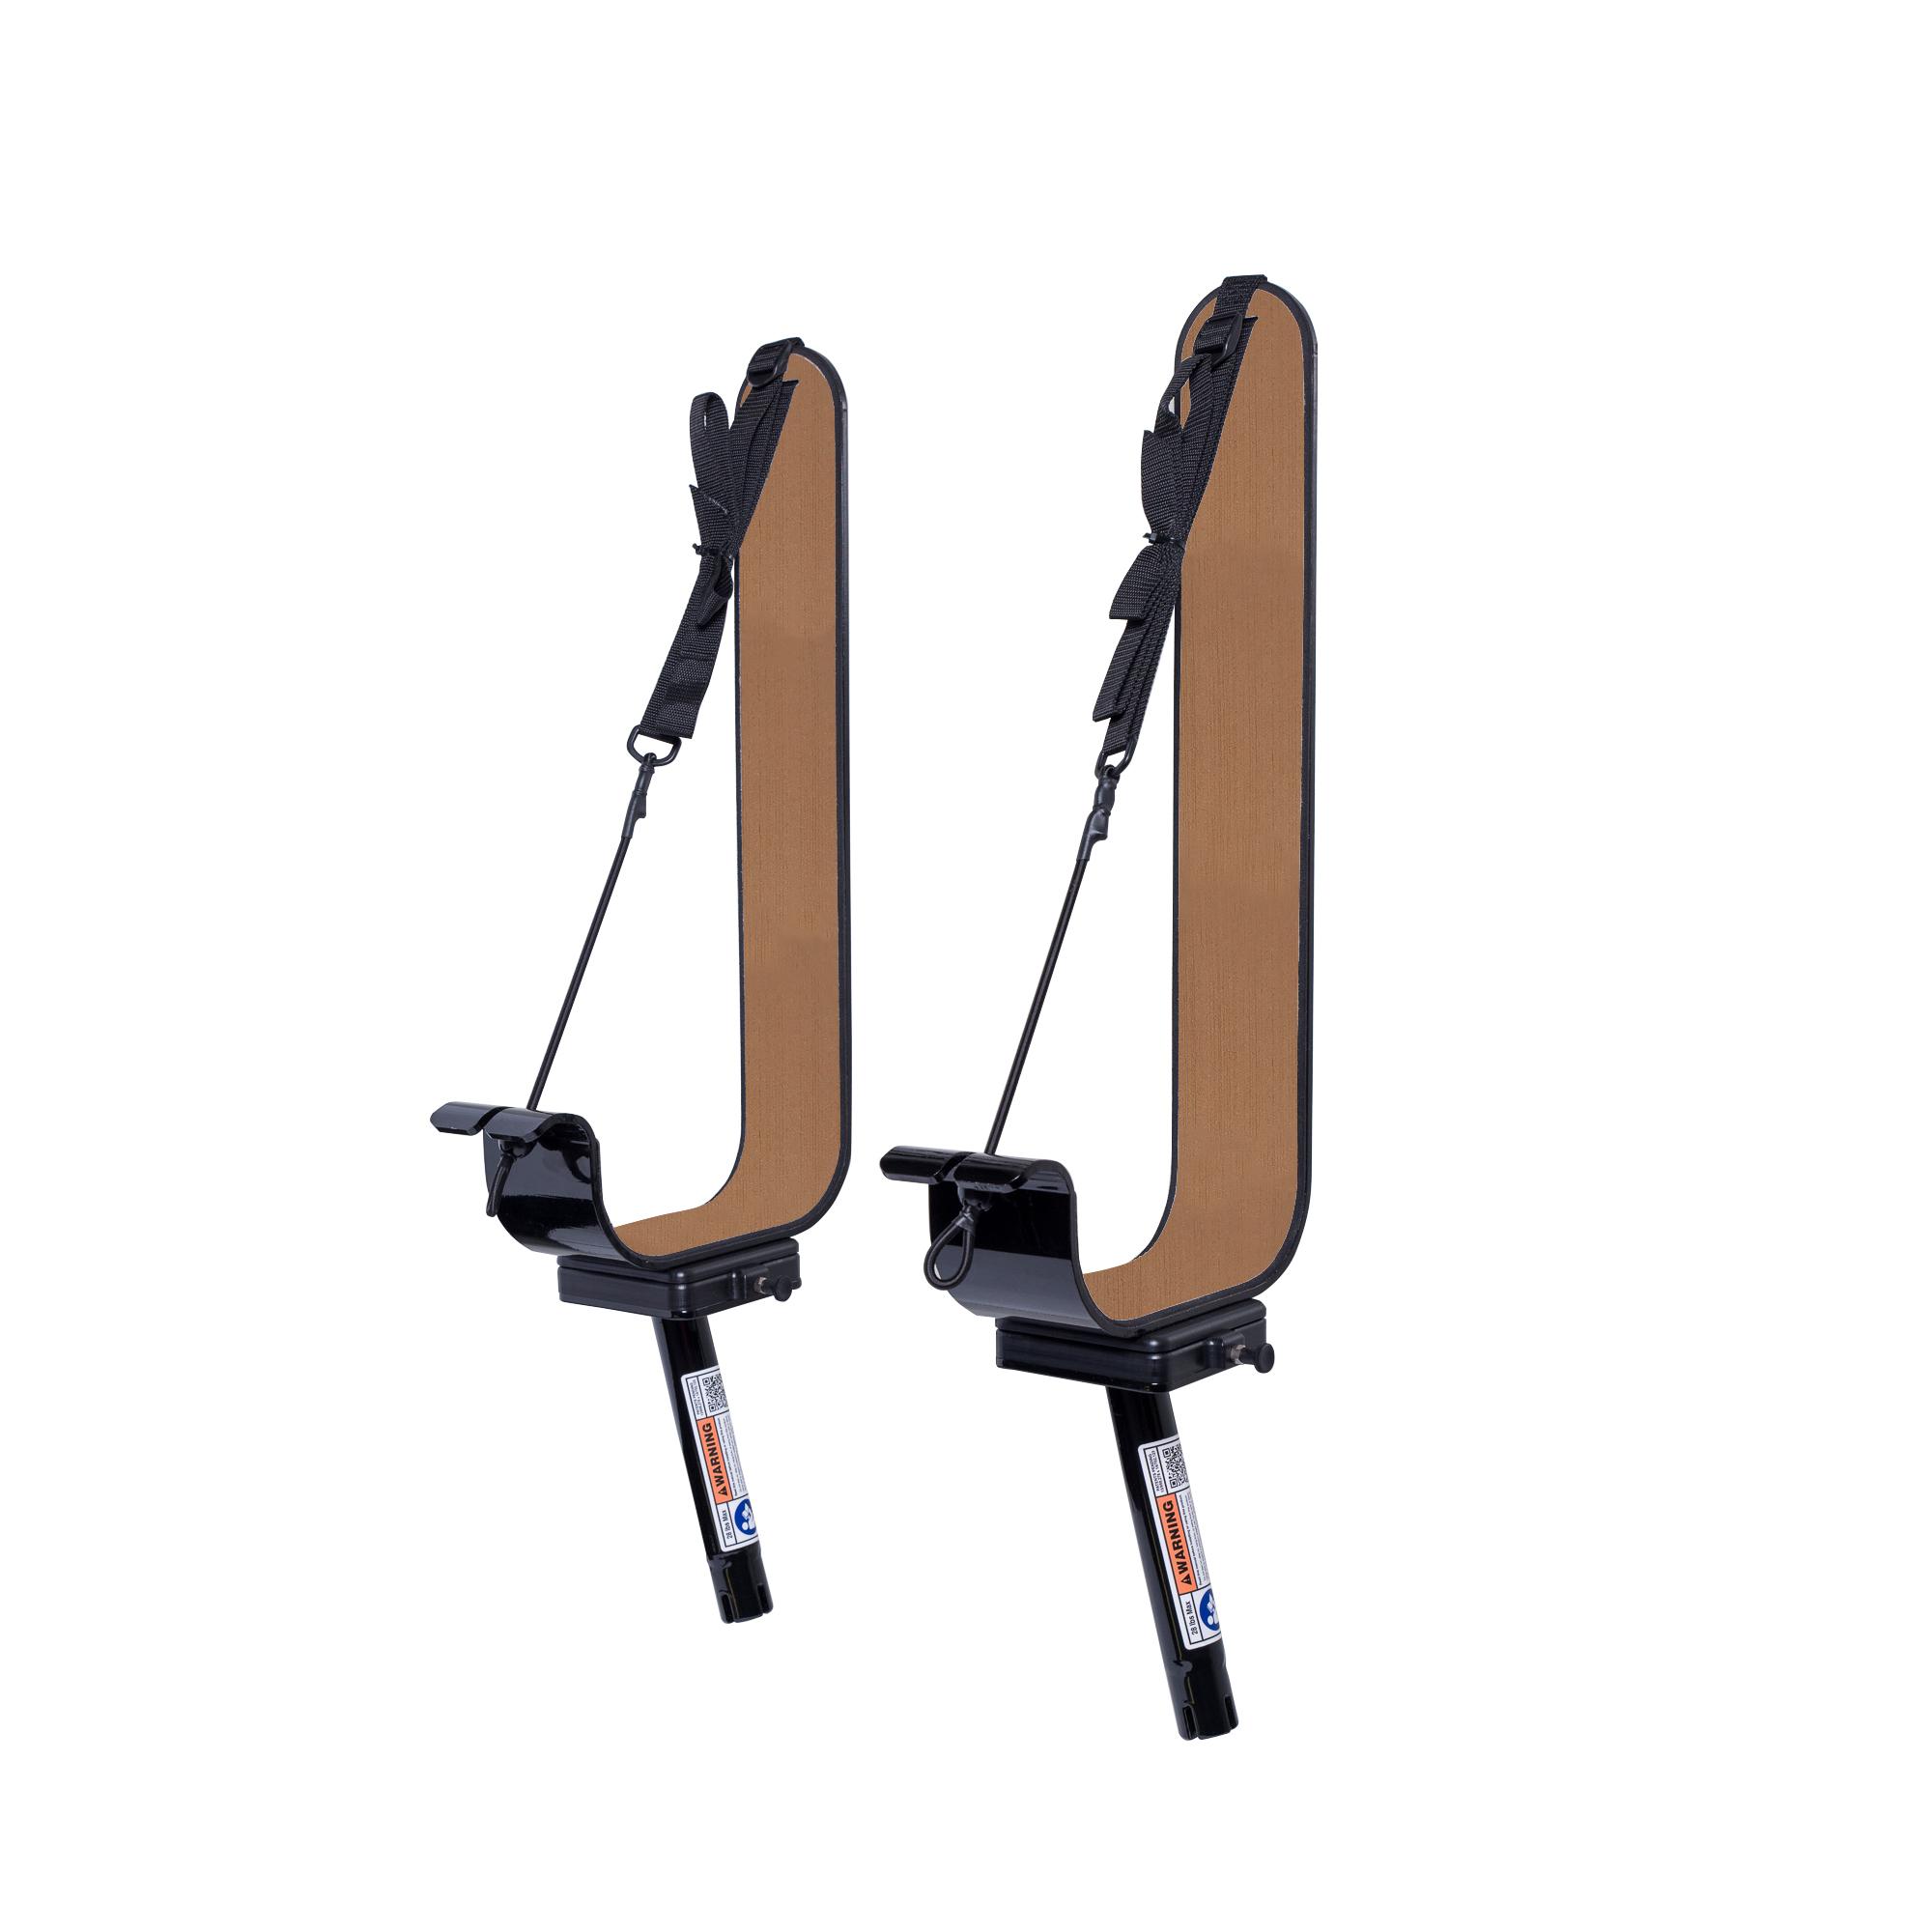 Manta Racks L2K Black Paddleboard/Kayak Rack For 15° Rod Holders